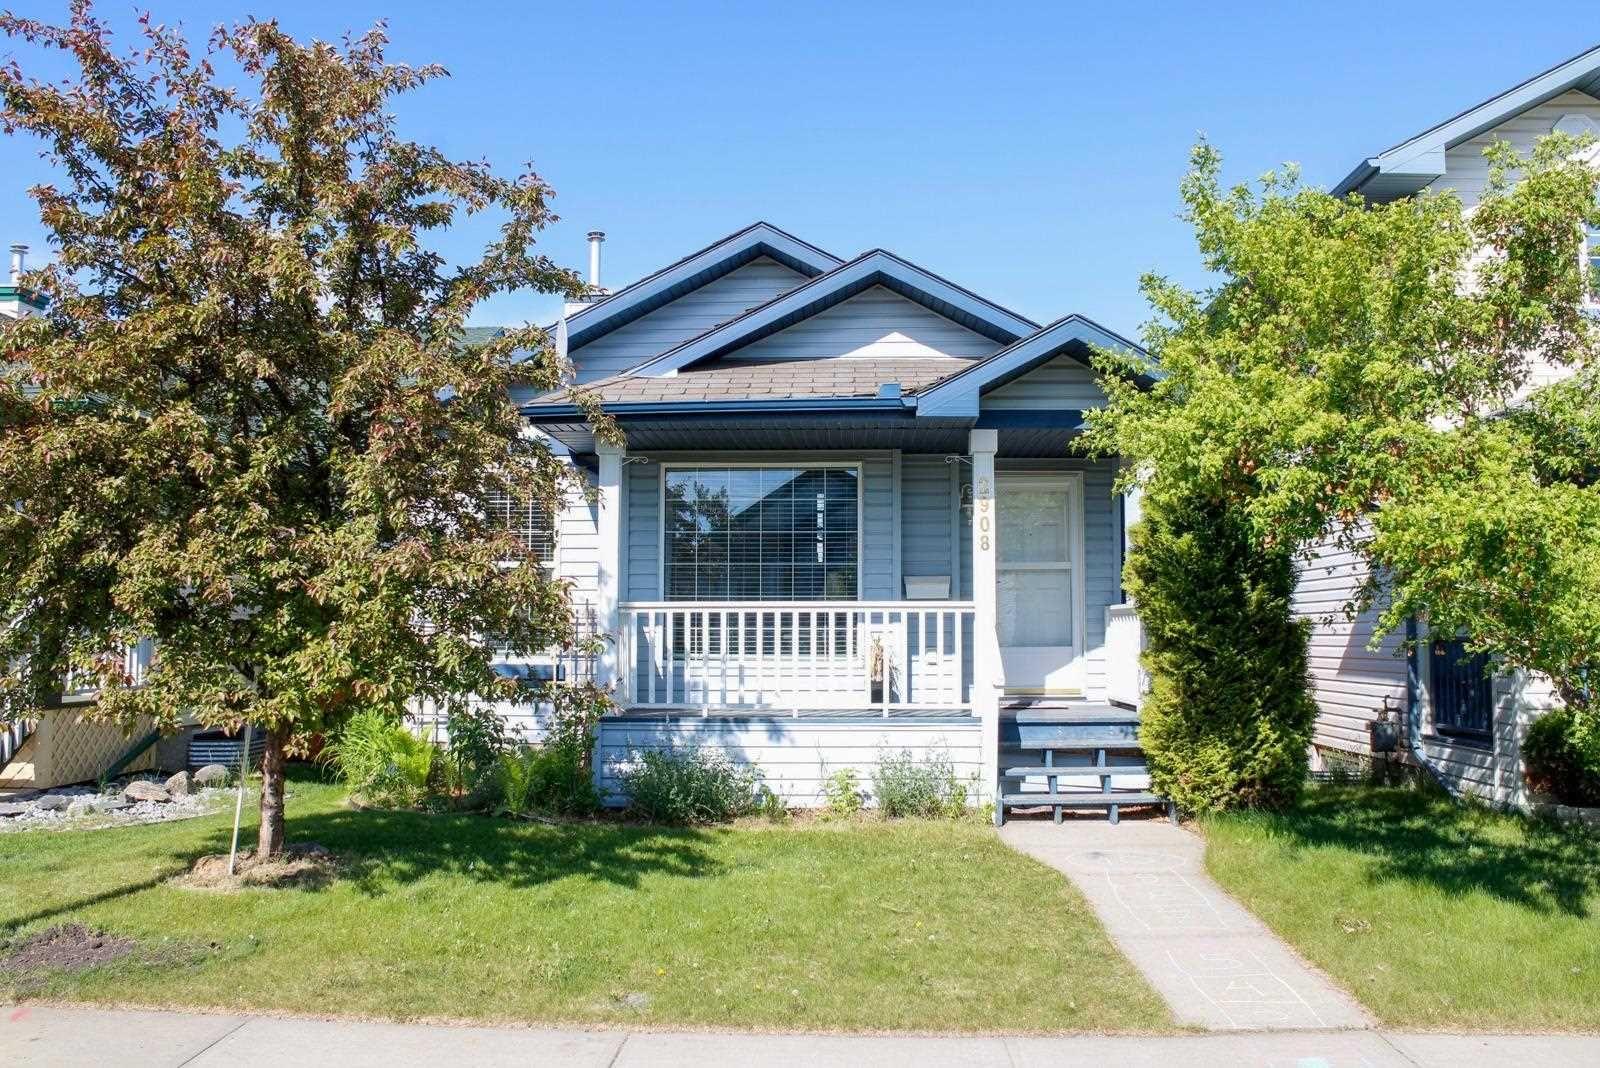 Main Photo: 2908 31 Street in Edmonton: Zone 30 House for sale : MLS®# E4261905